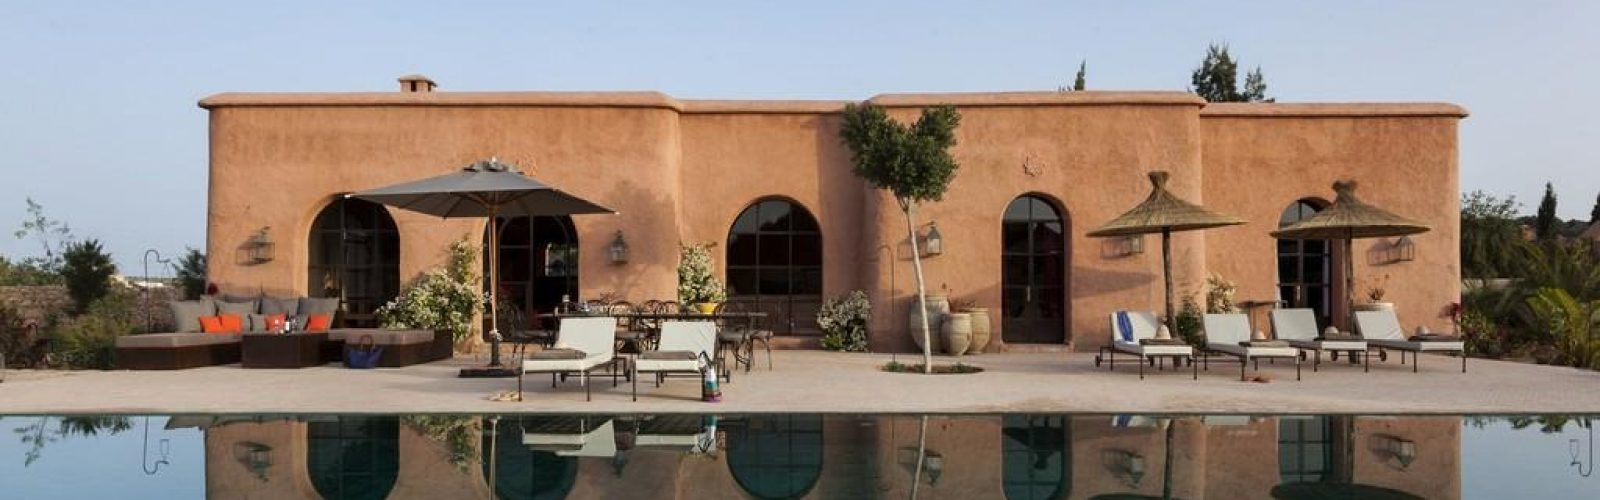 Villa Dans La Campagnes Du0027Essaouira Maroc, Avec Piscine Privée U2013 123medina